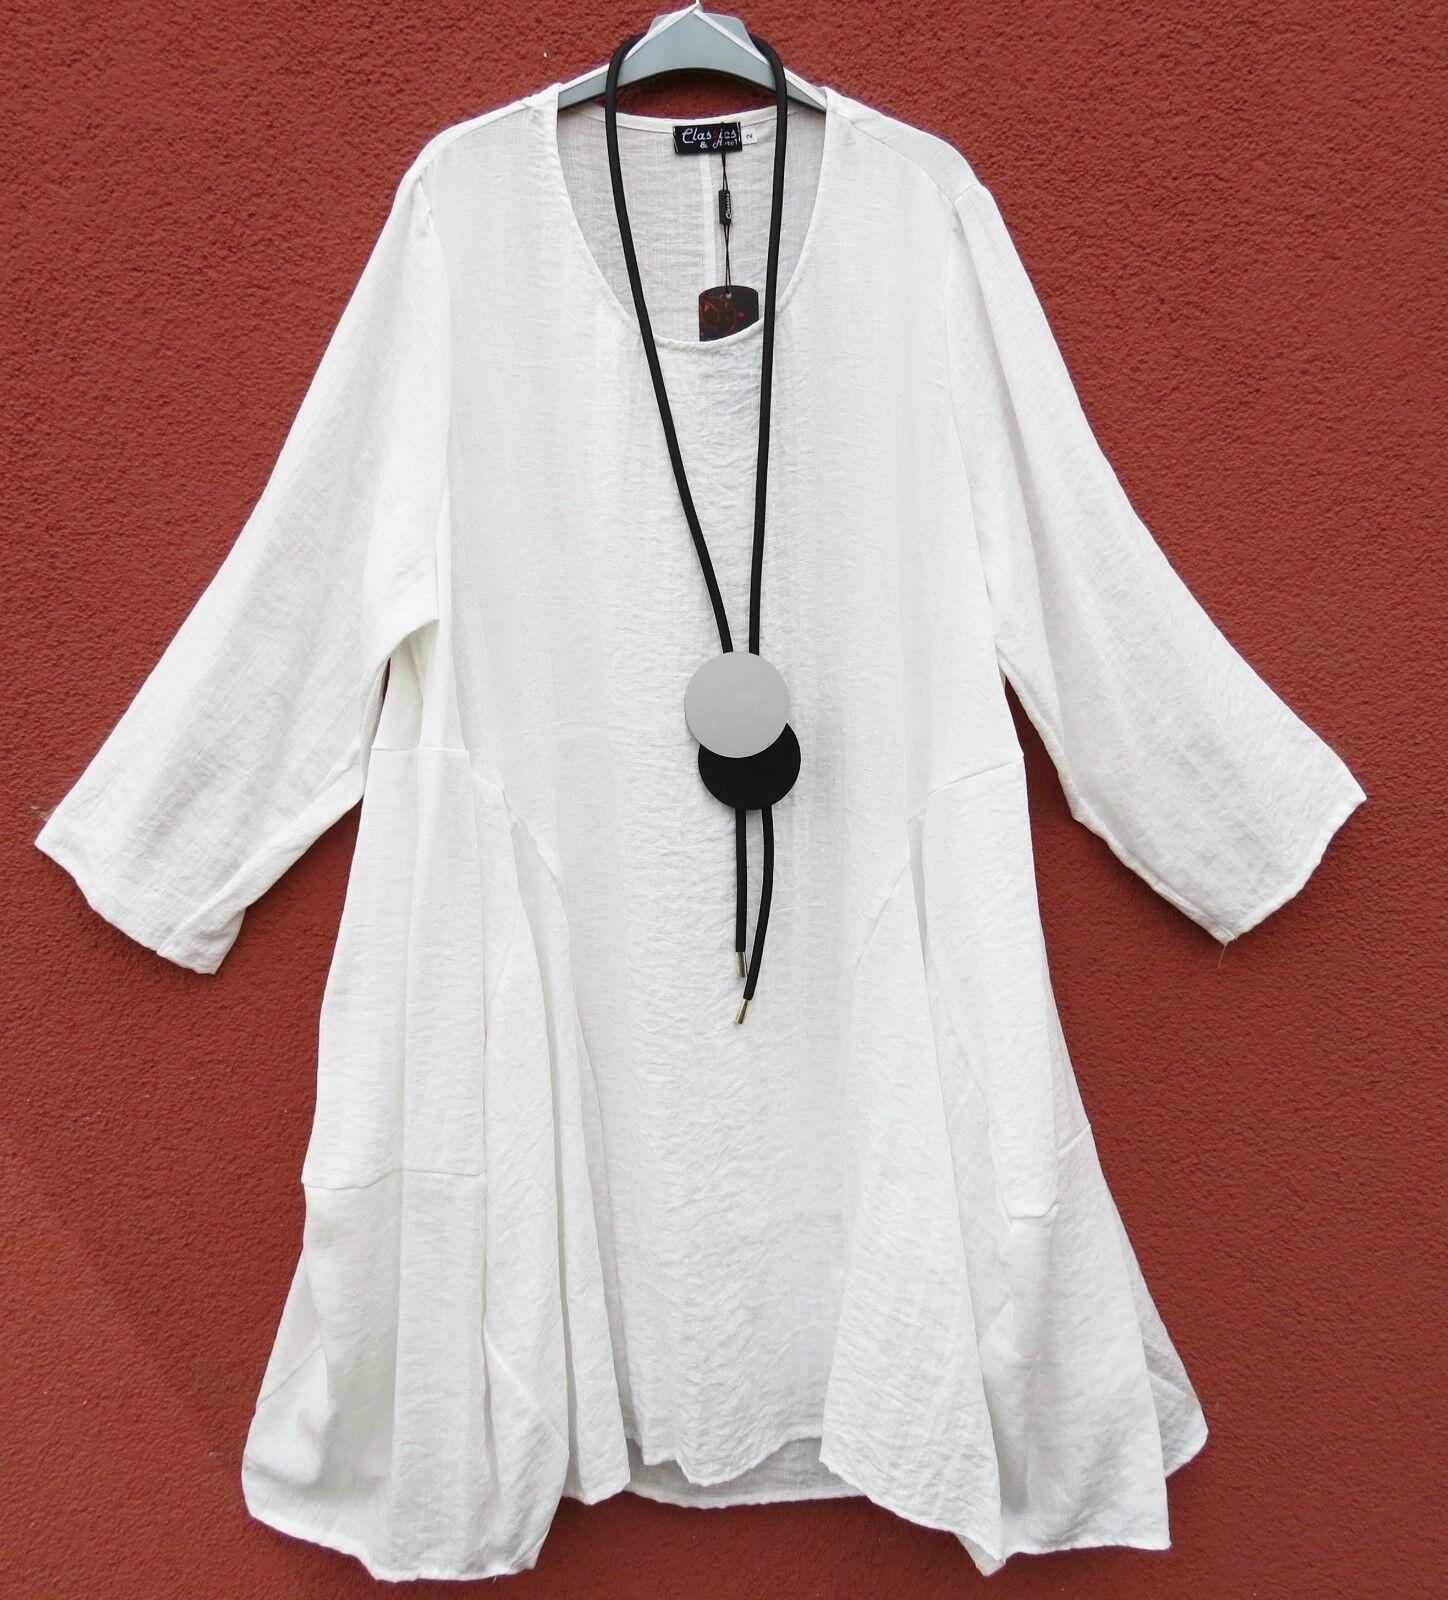 Classics & More Kleid Dress Robe Vestido Vestido Vestido 50% Leinen Linen XL 48 50 Lagenlook ab11f7